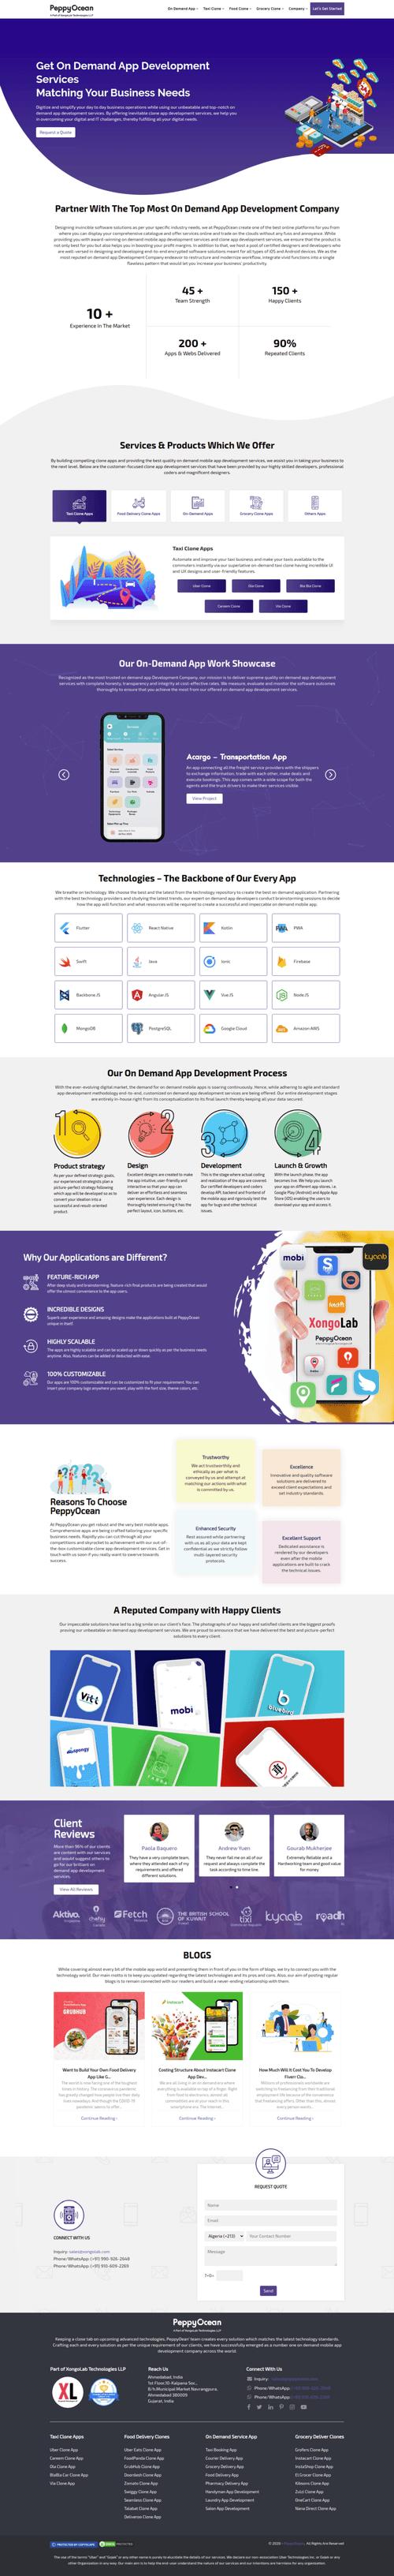 New Website with Stunning Design - PeppyOcean